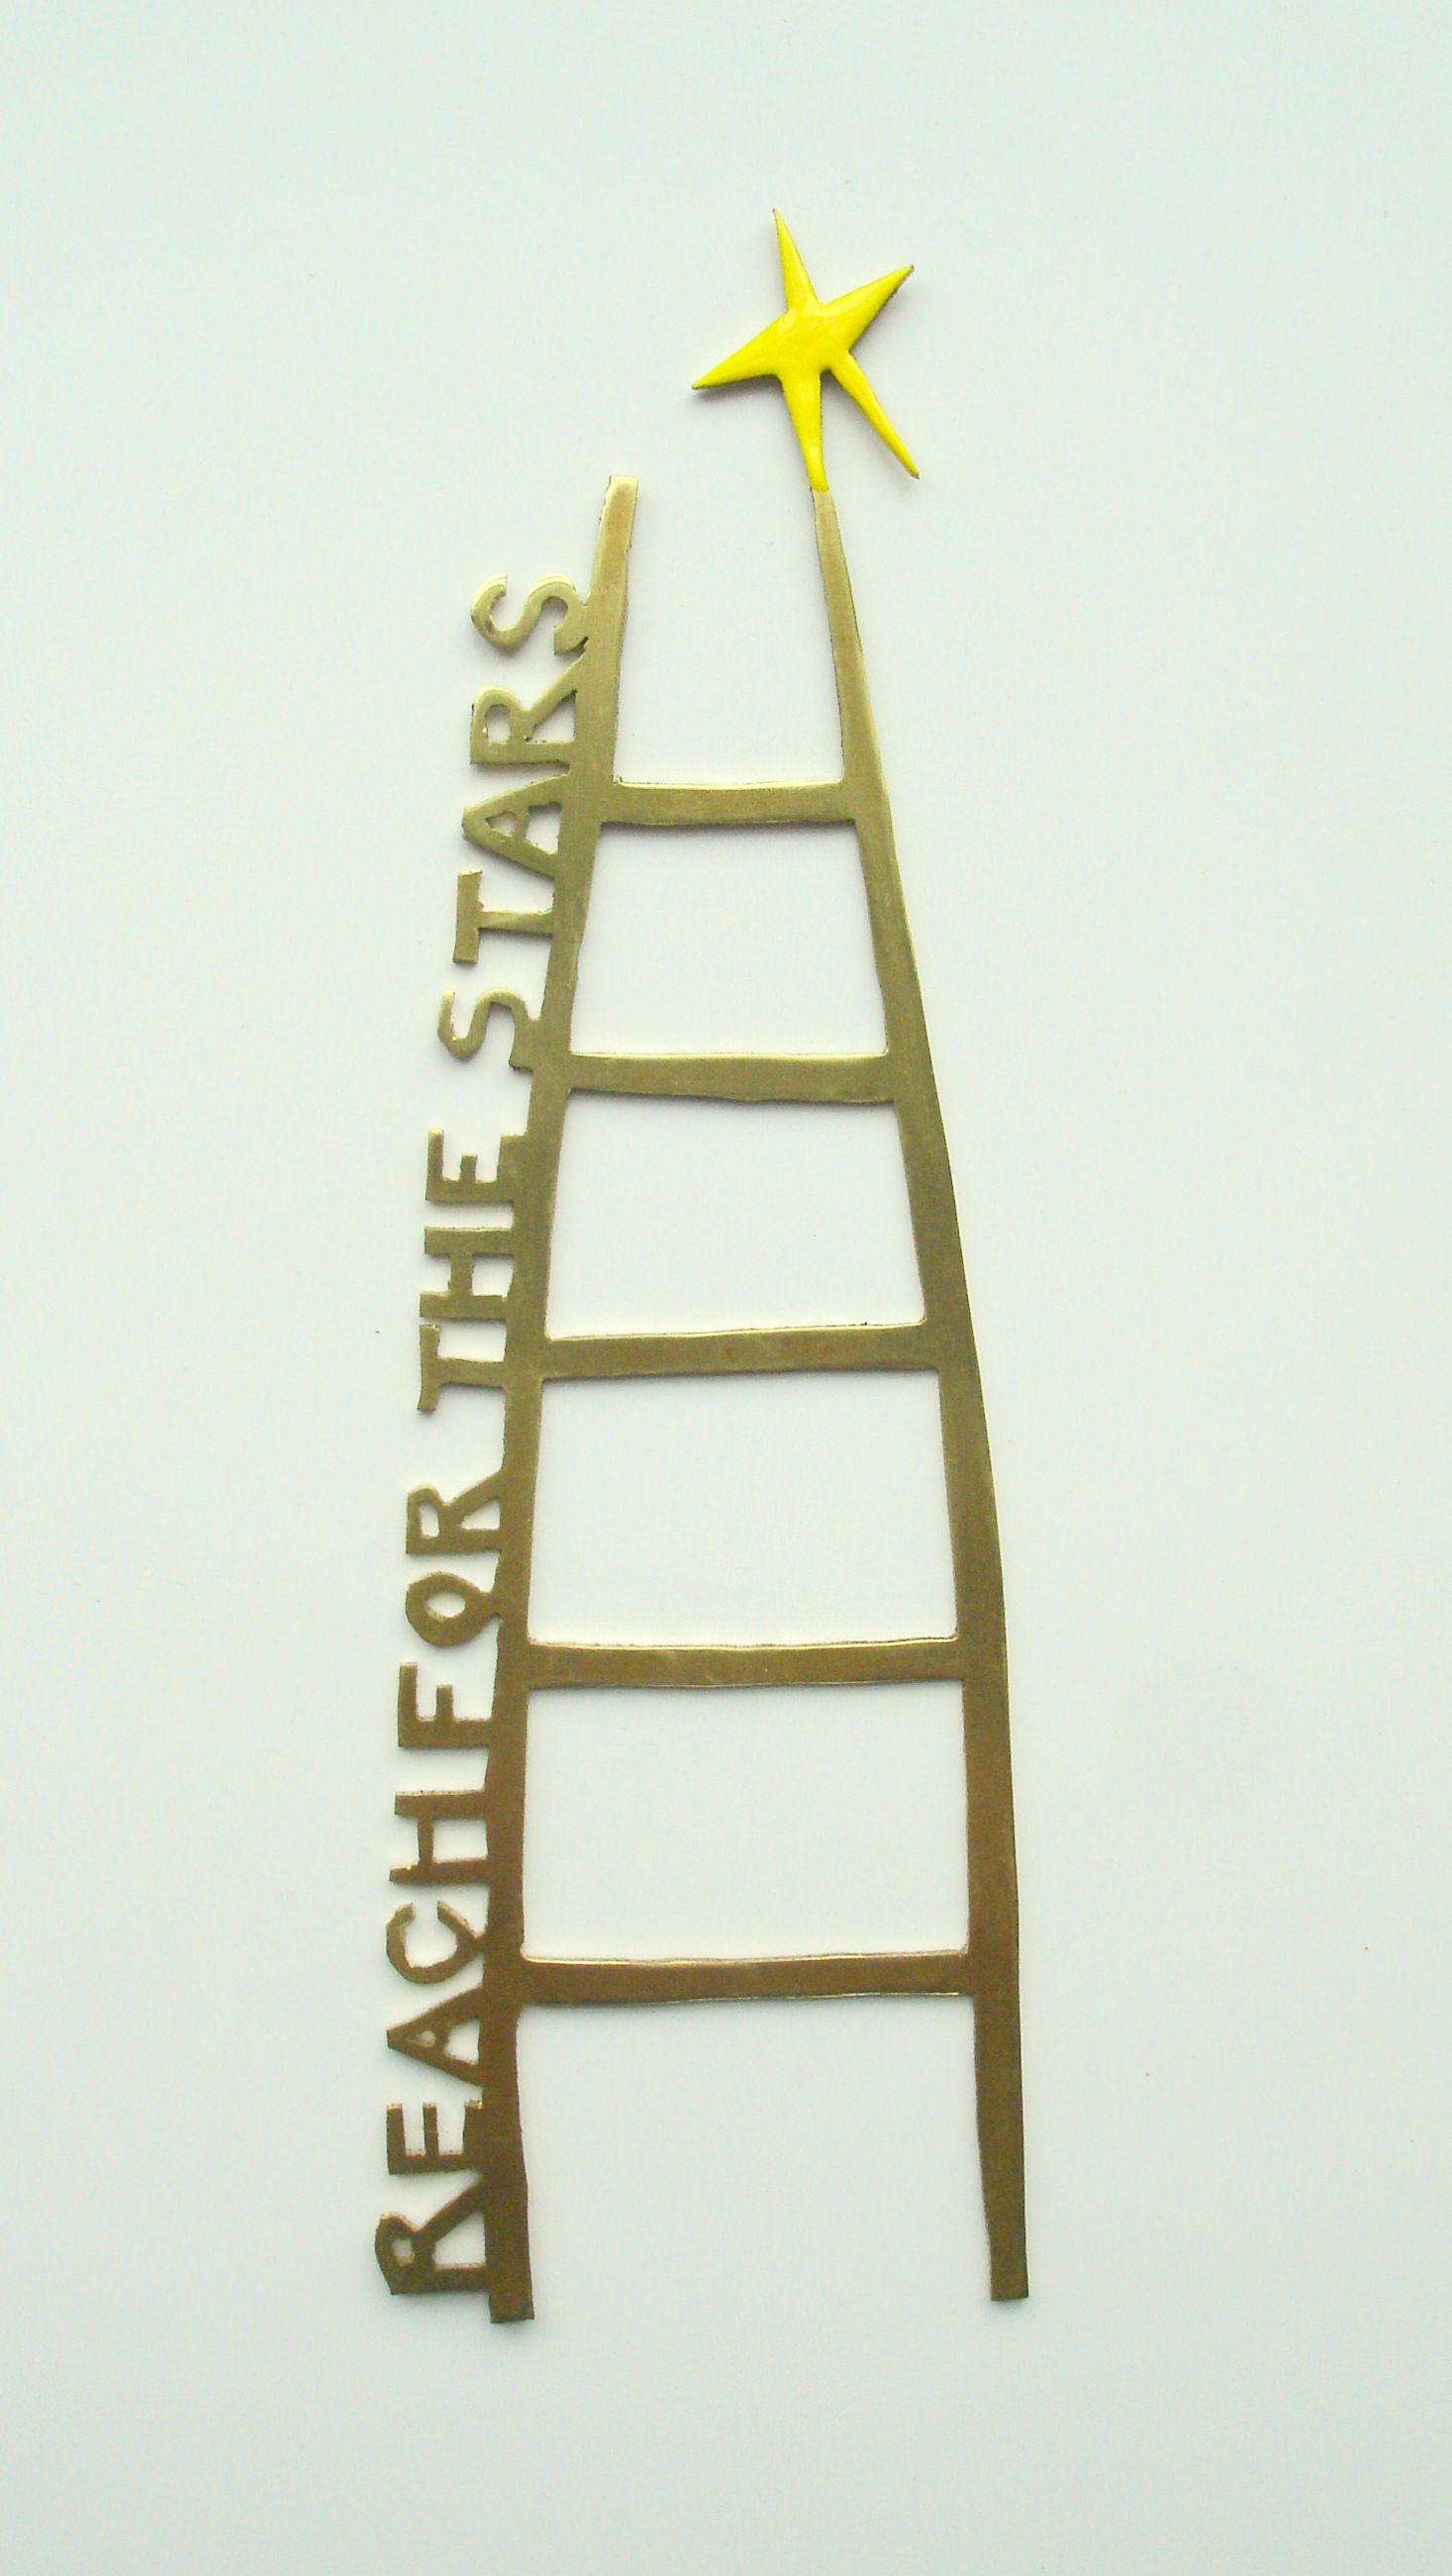 Brass ladder with yellow star by josephine gomersall designs end